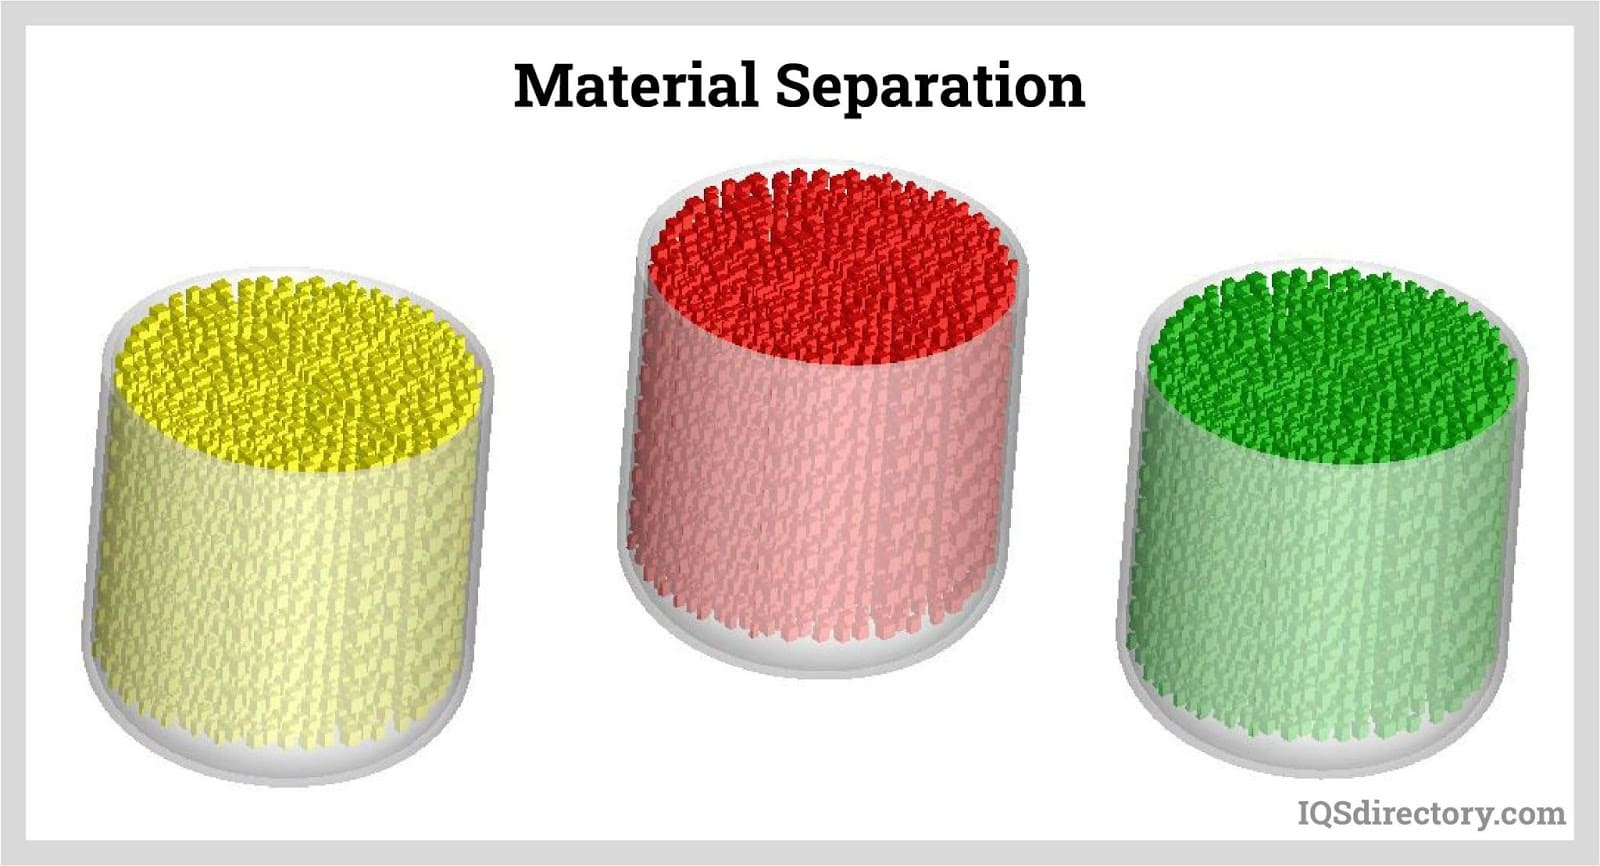 Material Separation